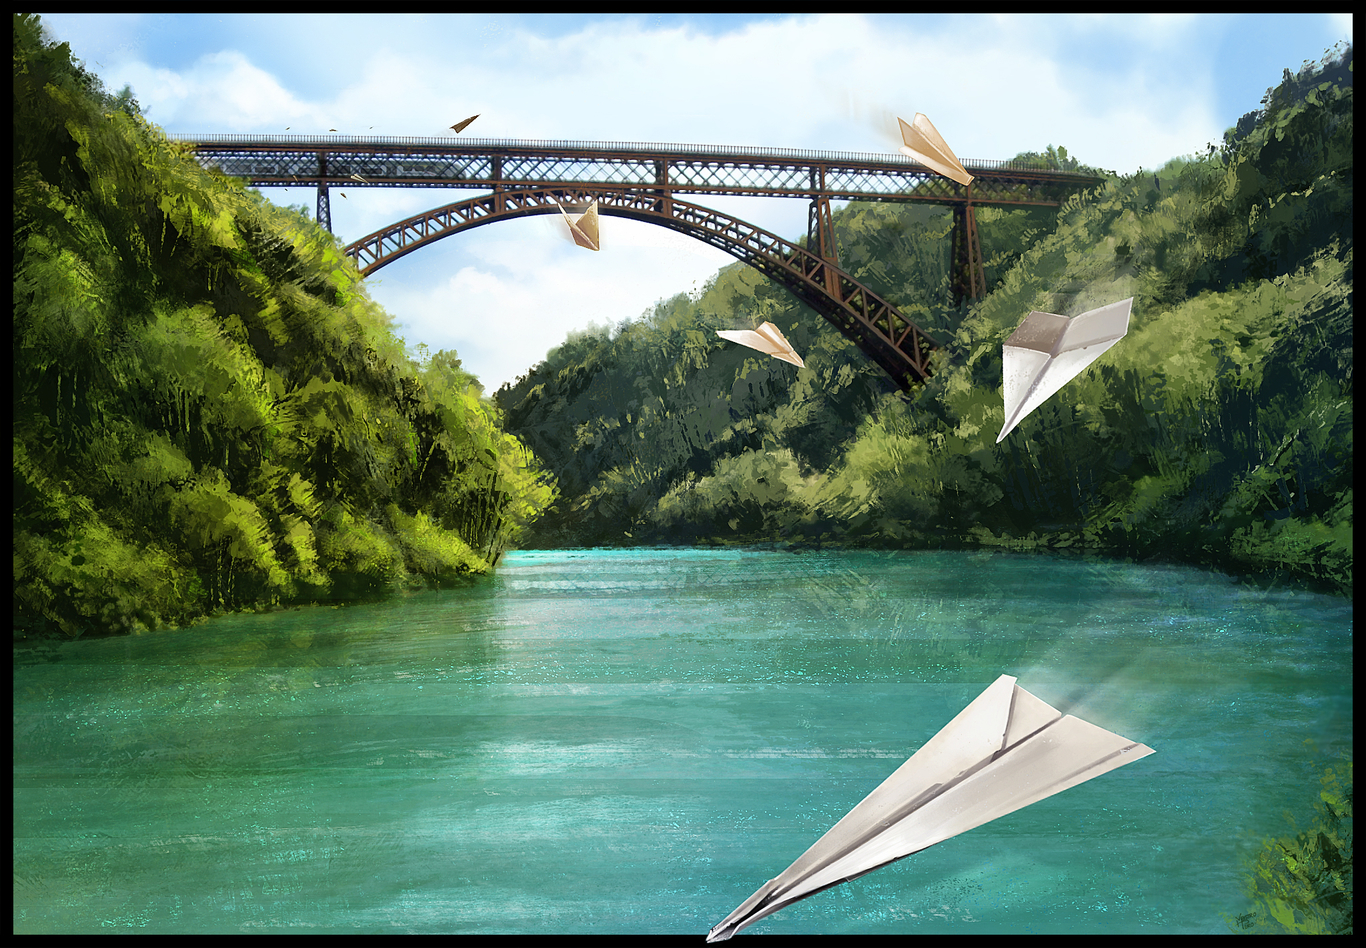 Mastropero bridge smichele 1 c3b3539d 2t5o